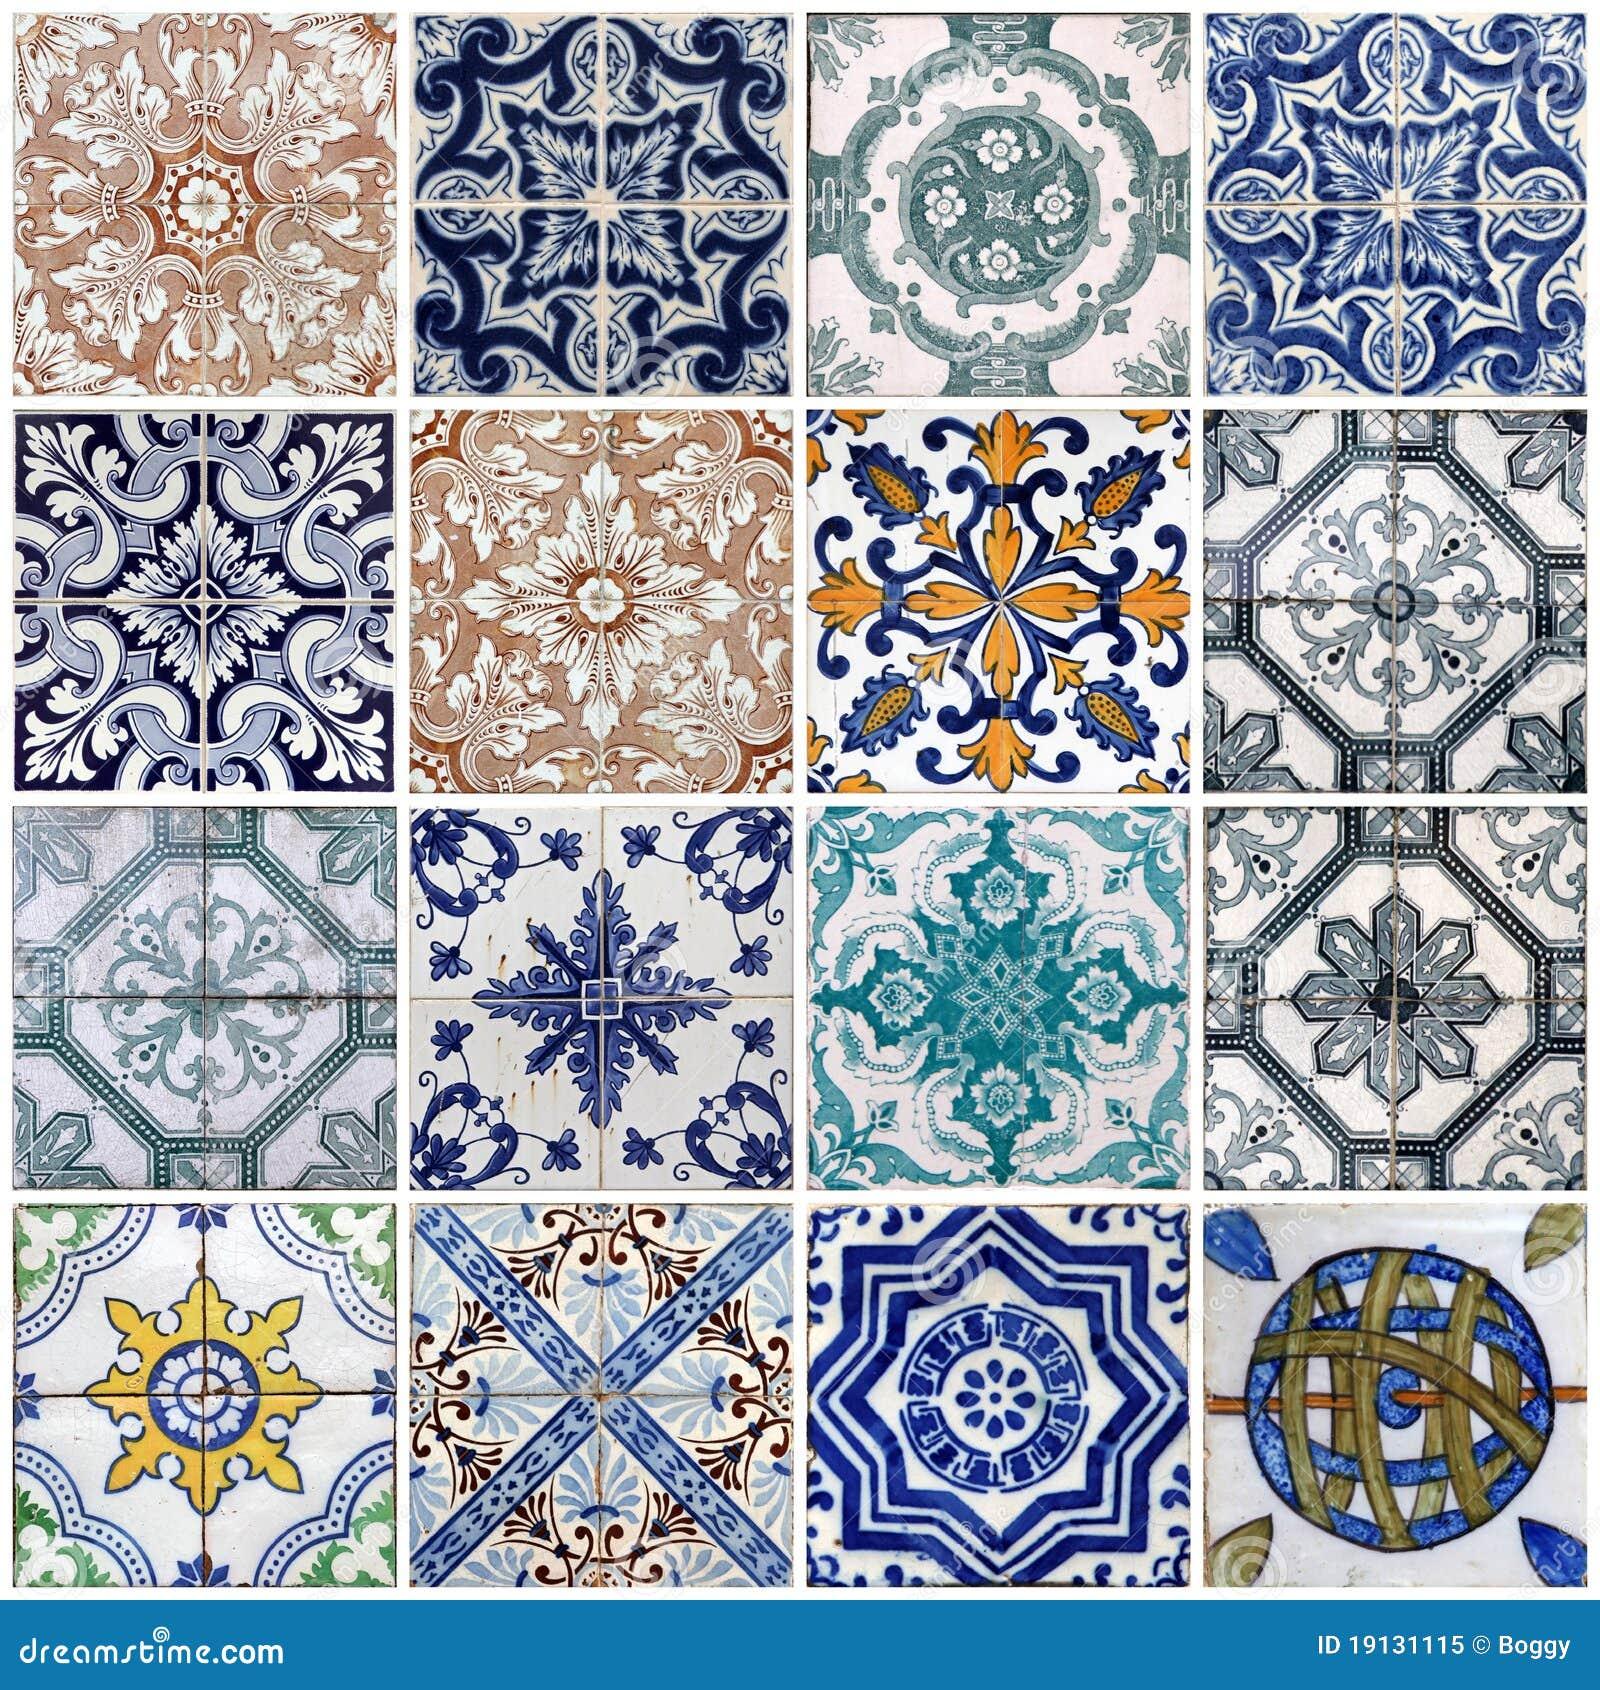 Lissabon fliesen lizenzfreies stockfoto bild 19131115 for Muster tapete